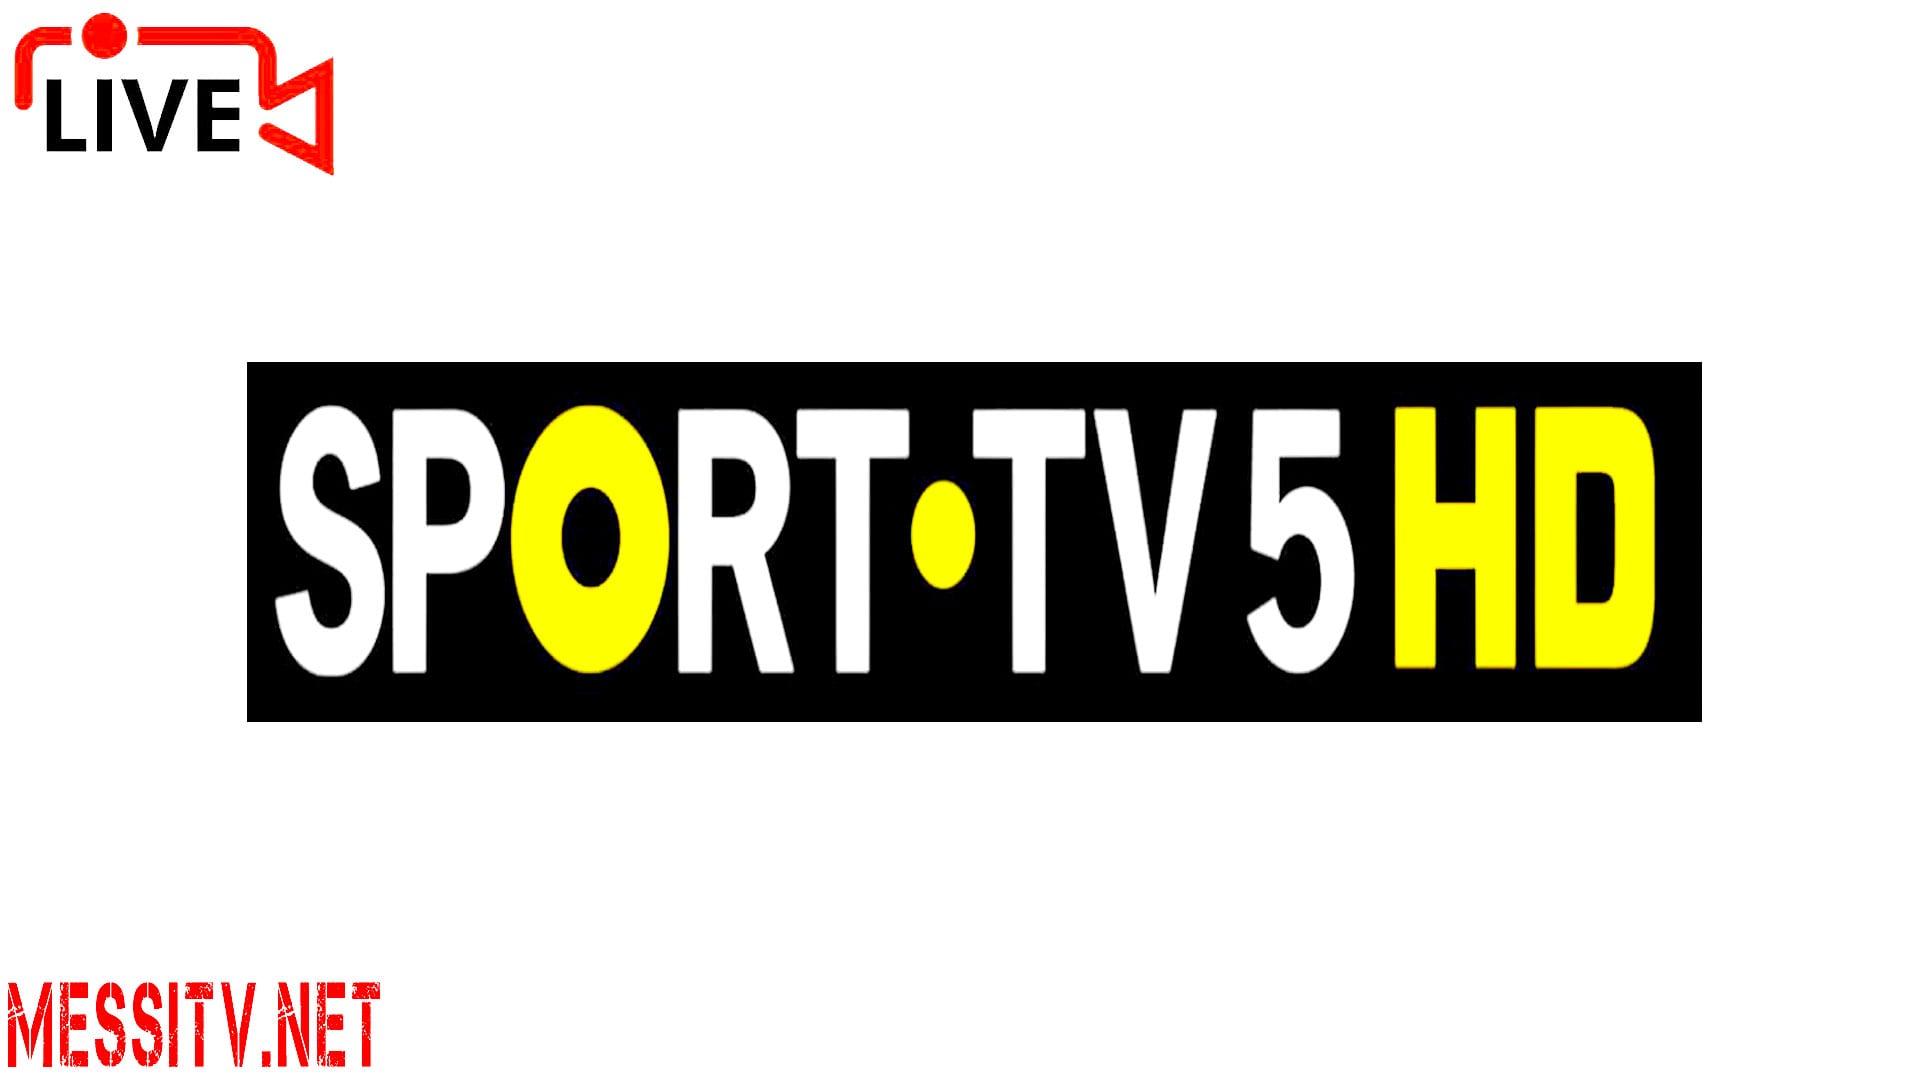 Sport TV 1 HD Portugal, Sport TV 2 HD Portugal, Sport TV 3 HD Portugal, Sport TV 4 HD Portugal, Sport TV 5 HD Portugal, Assistir Portugal TV ao vivo online, Sport TV 5 HD, SPORT TV5 HD